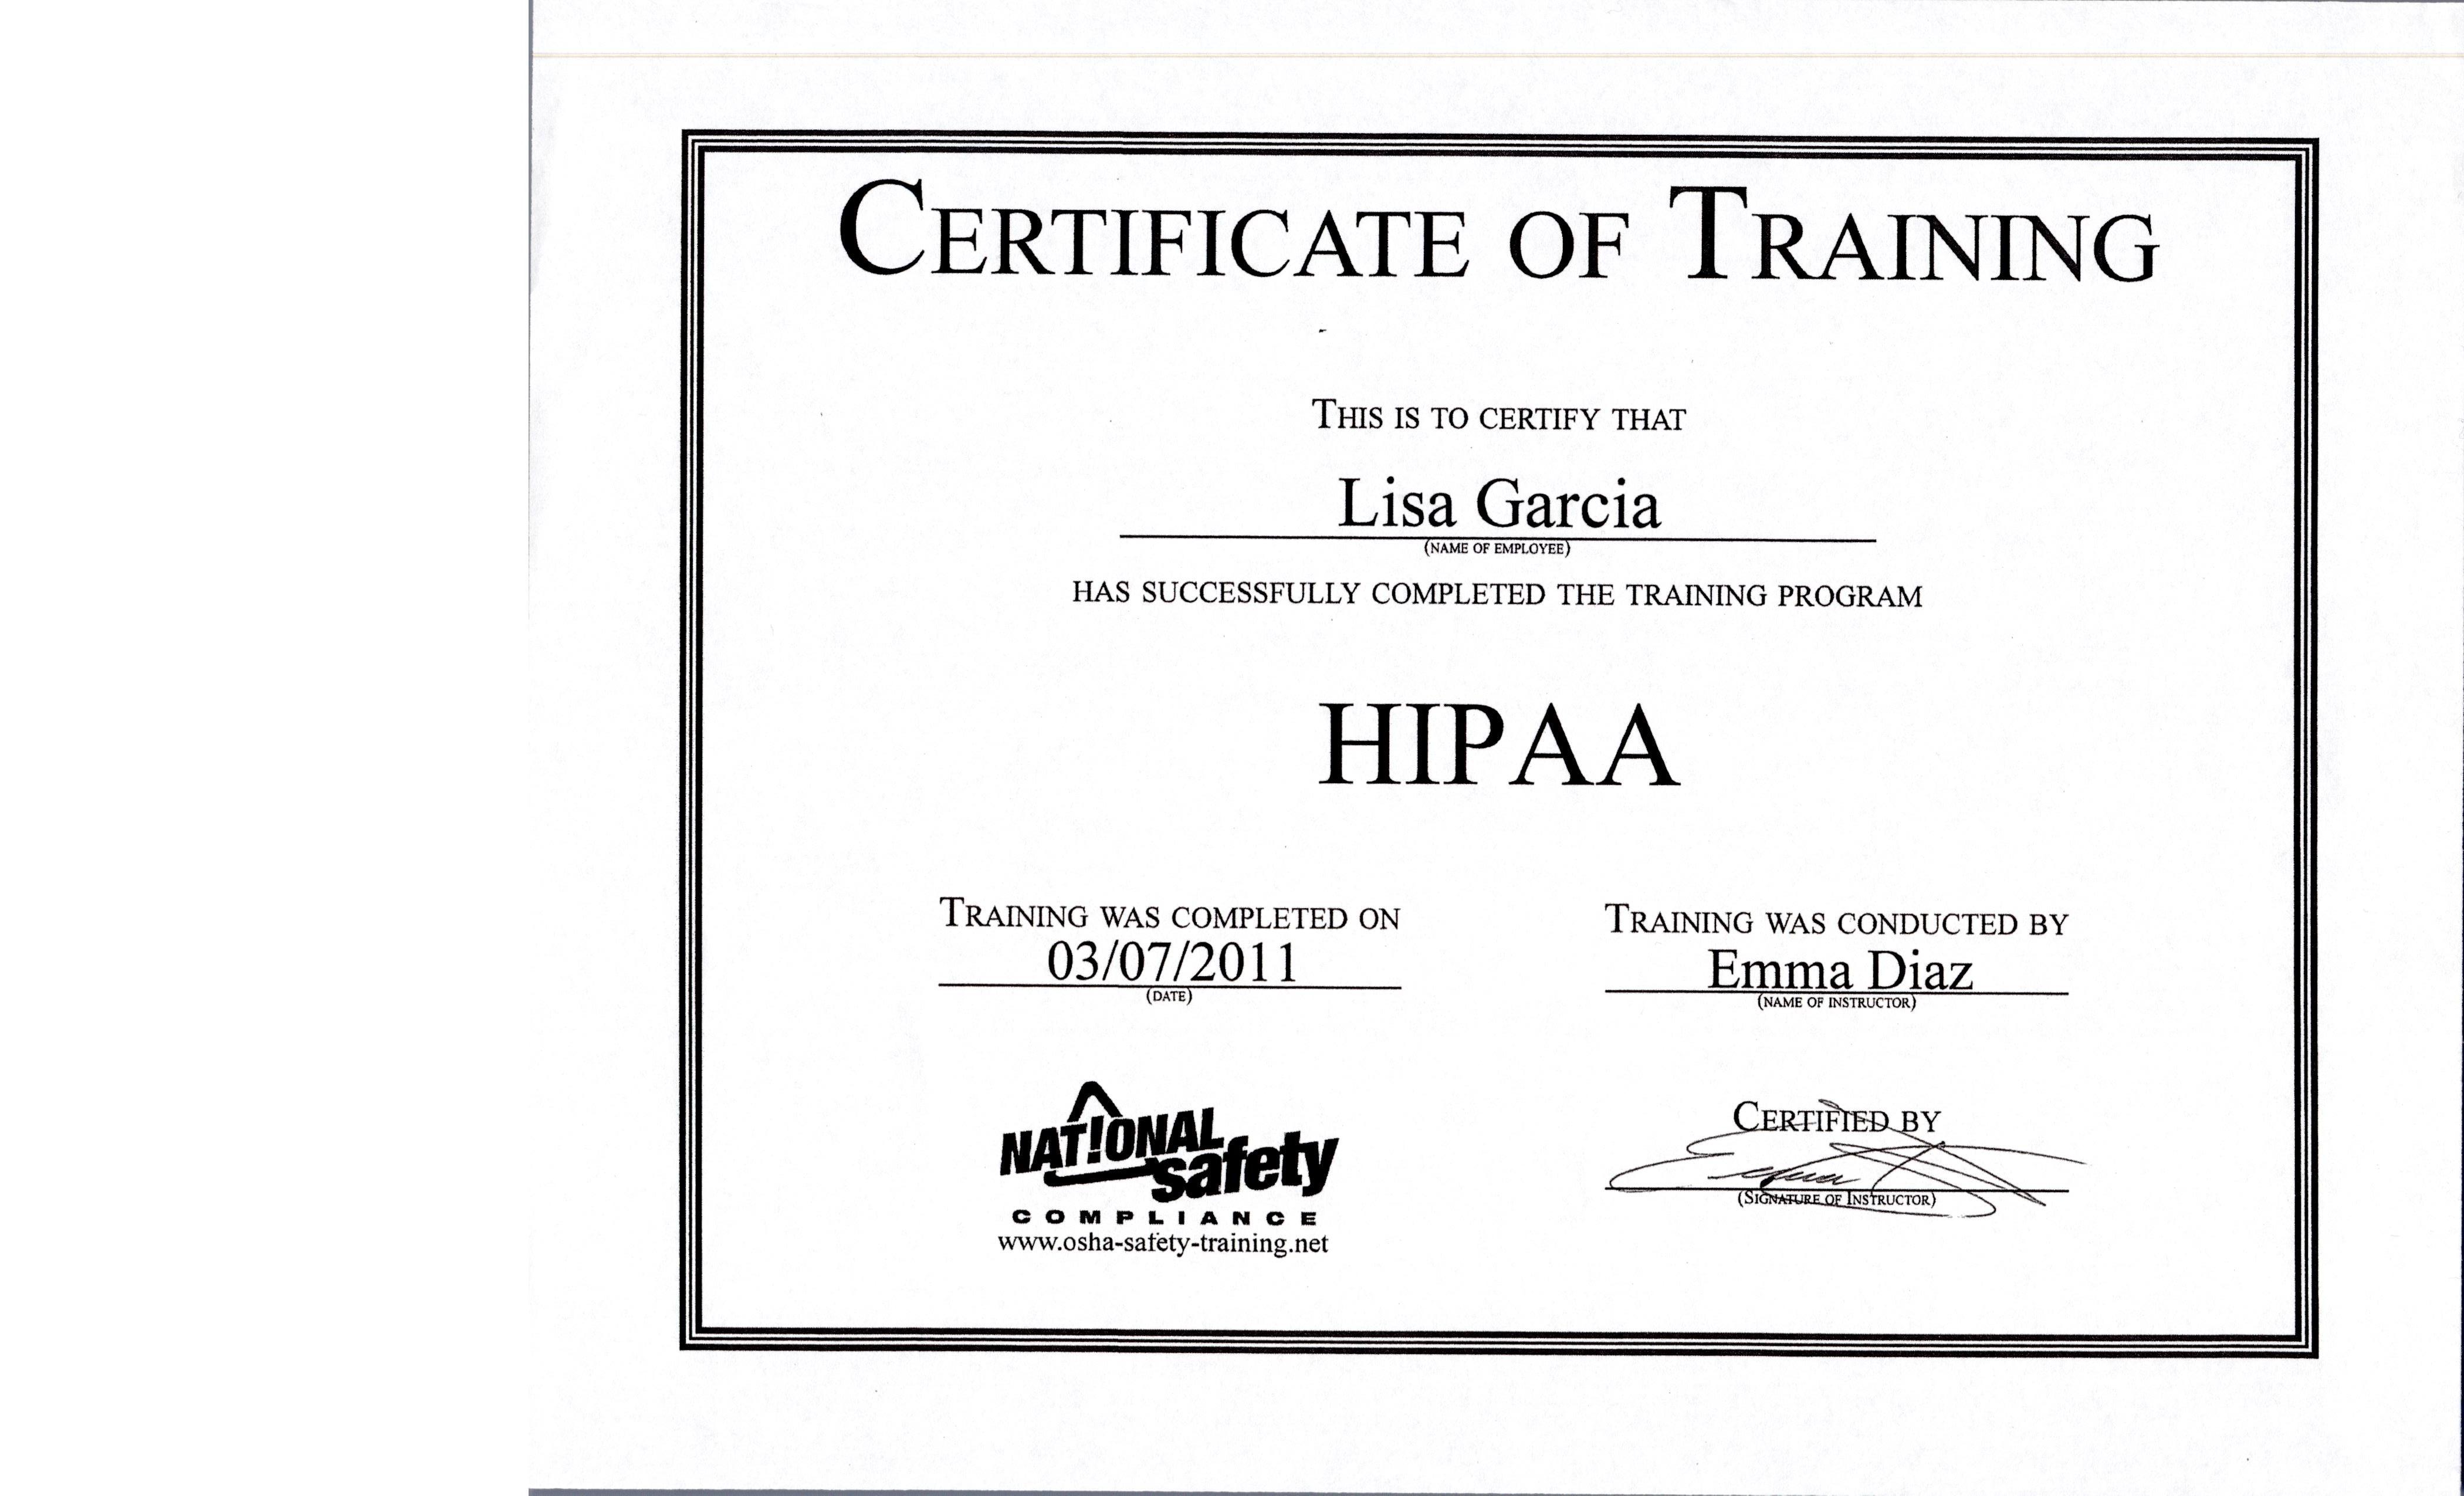 Awards And Certificates Lisa Garcia